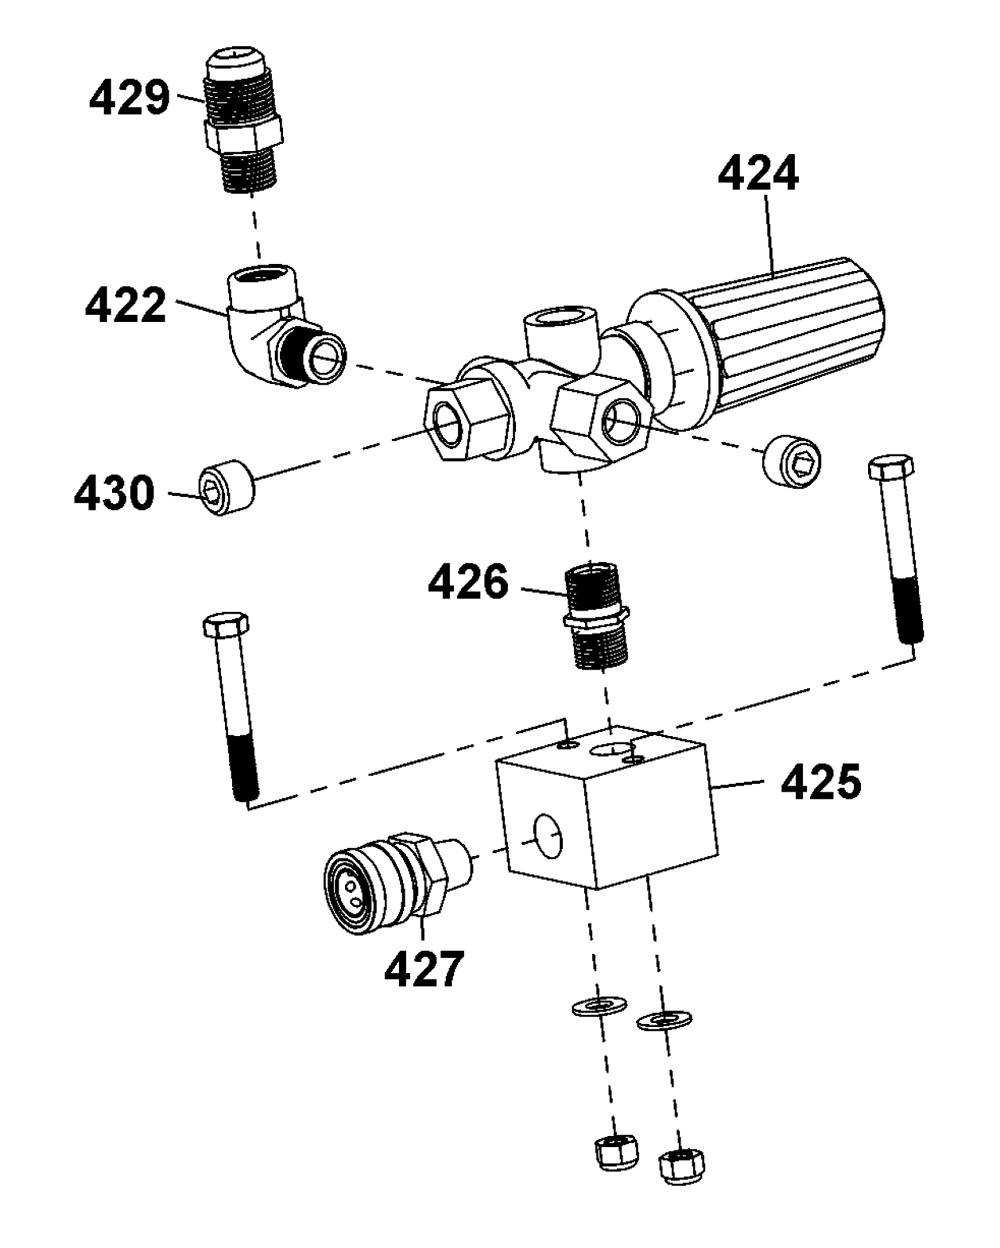 DXPW60606-T0-Dewalt-PB-2Break Down